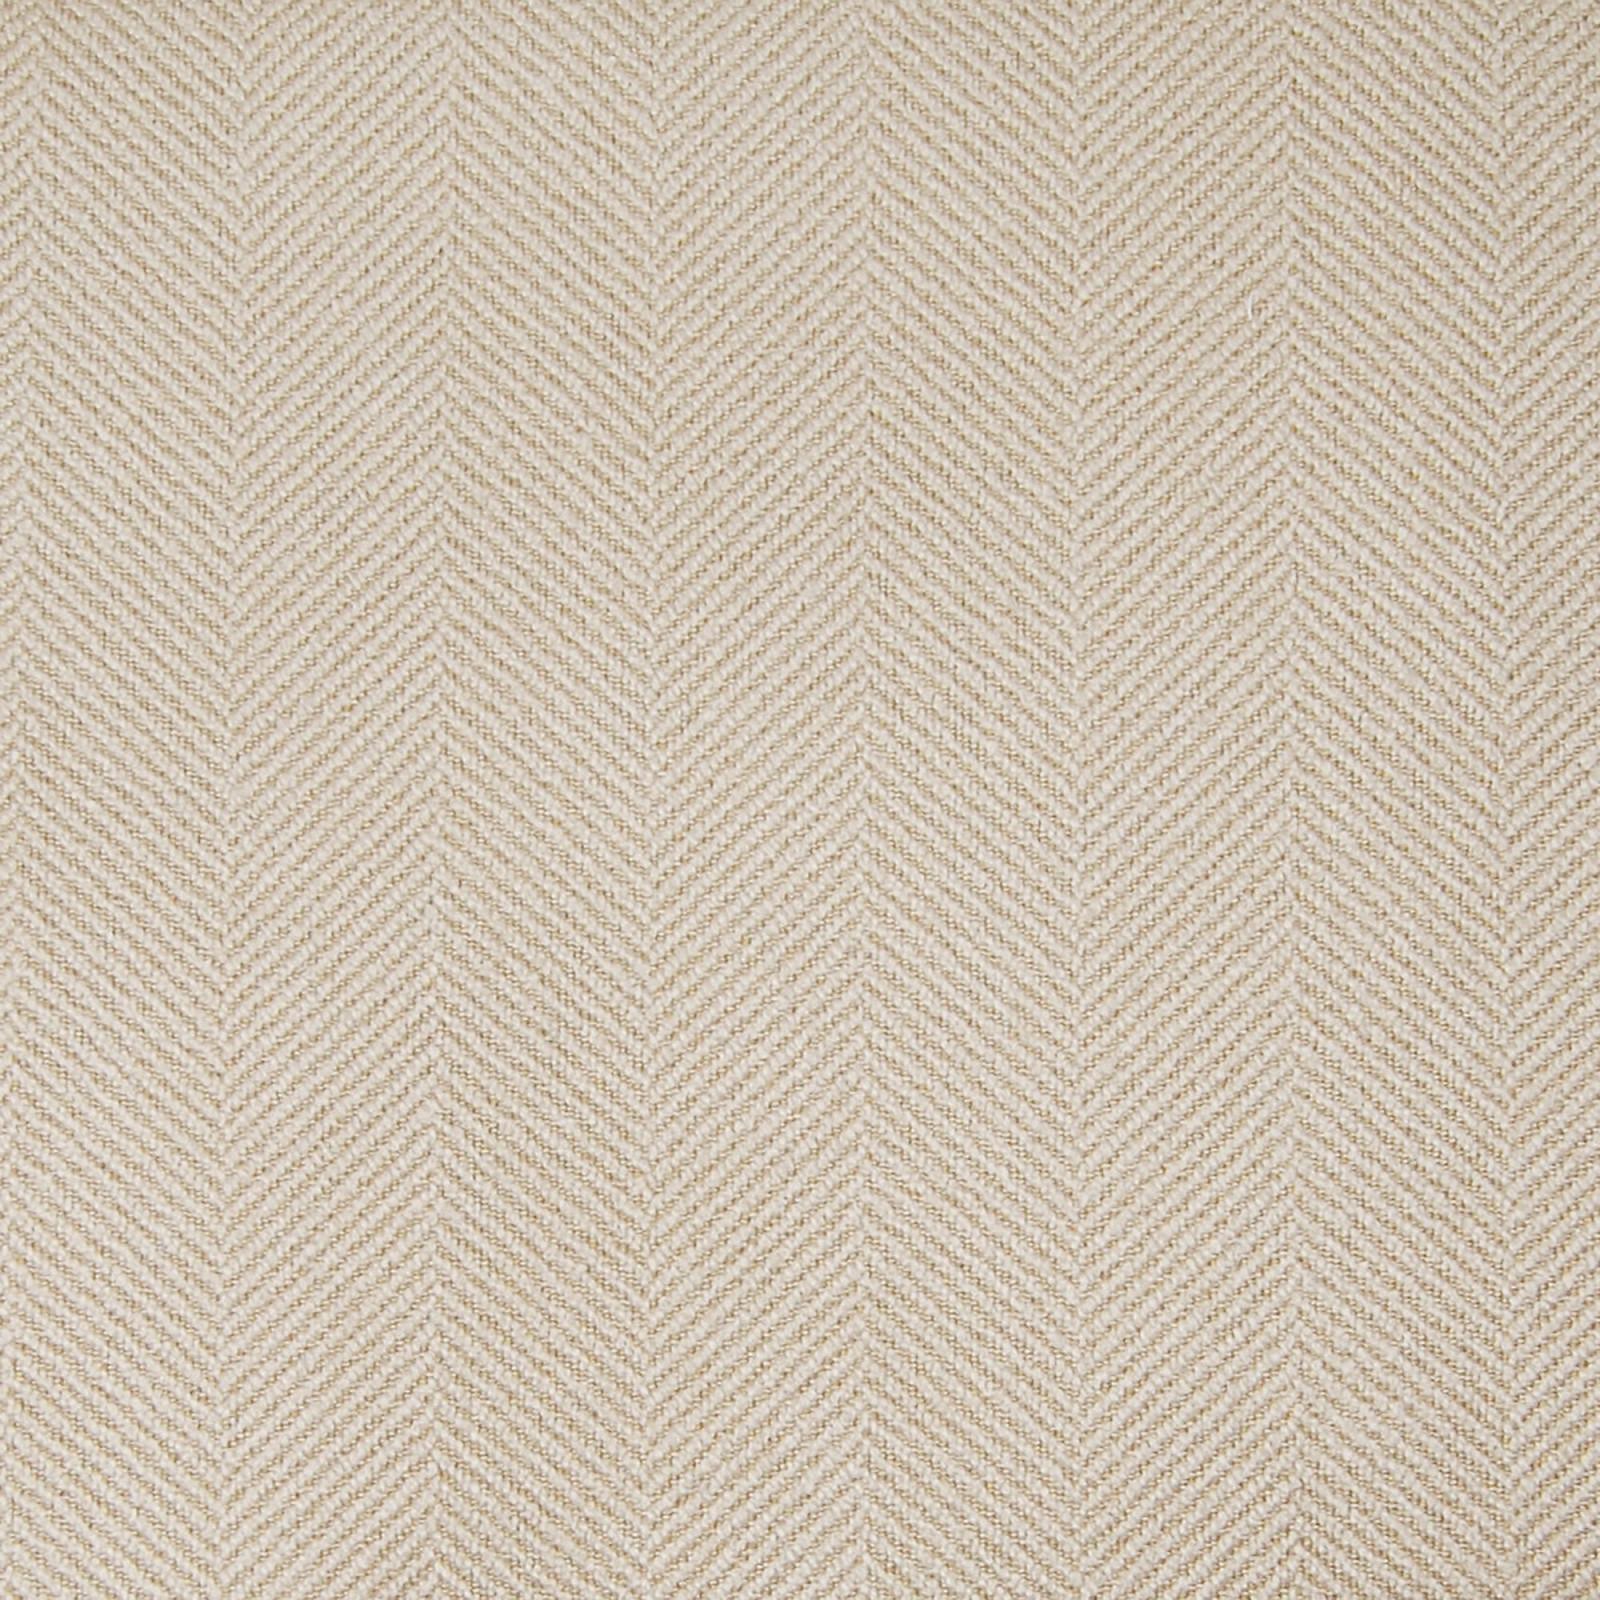 94207 Oatmeal Greenhouse Fabrics